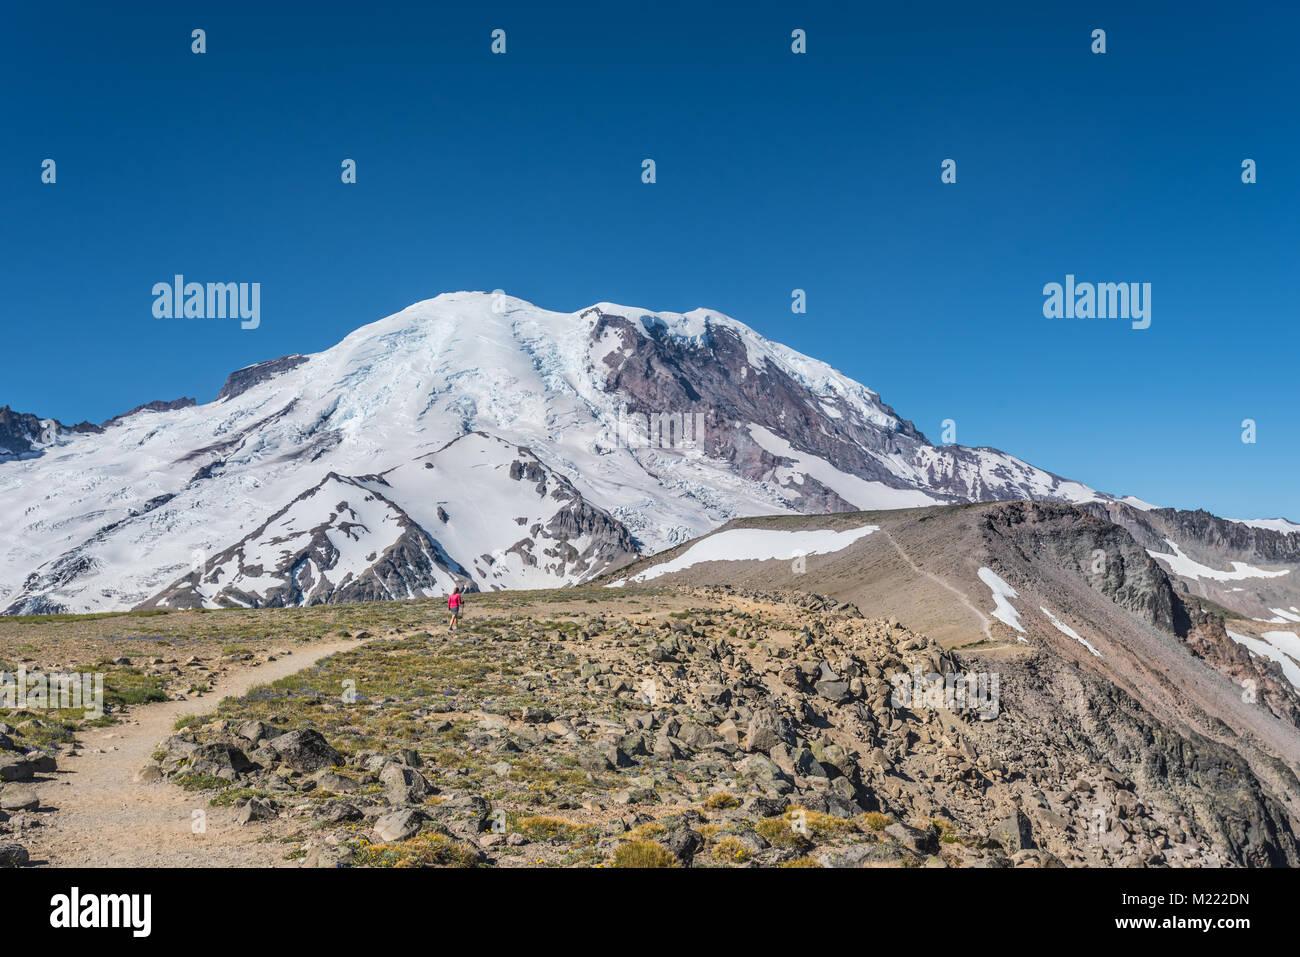 Woman Hikes Burroughs Mountain Trail underneath Mount Rainier - Stock Image